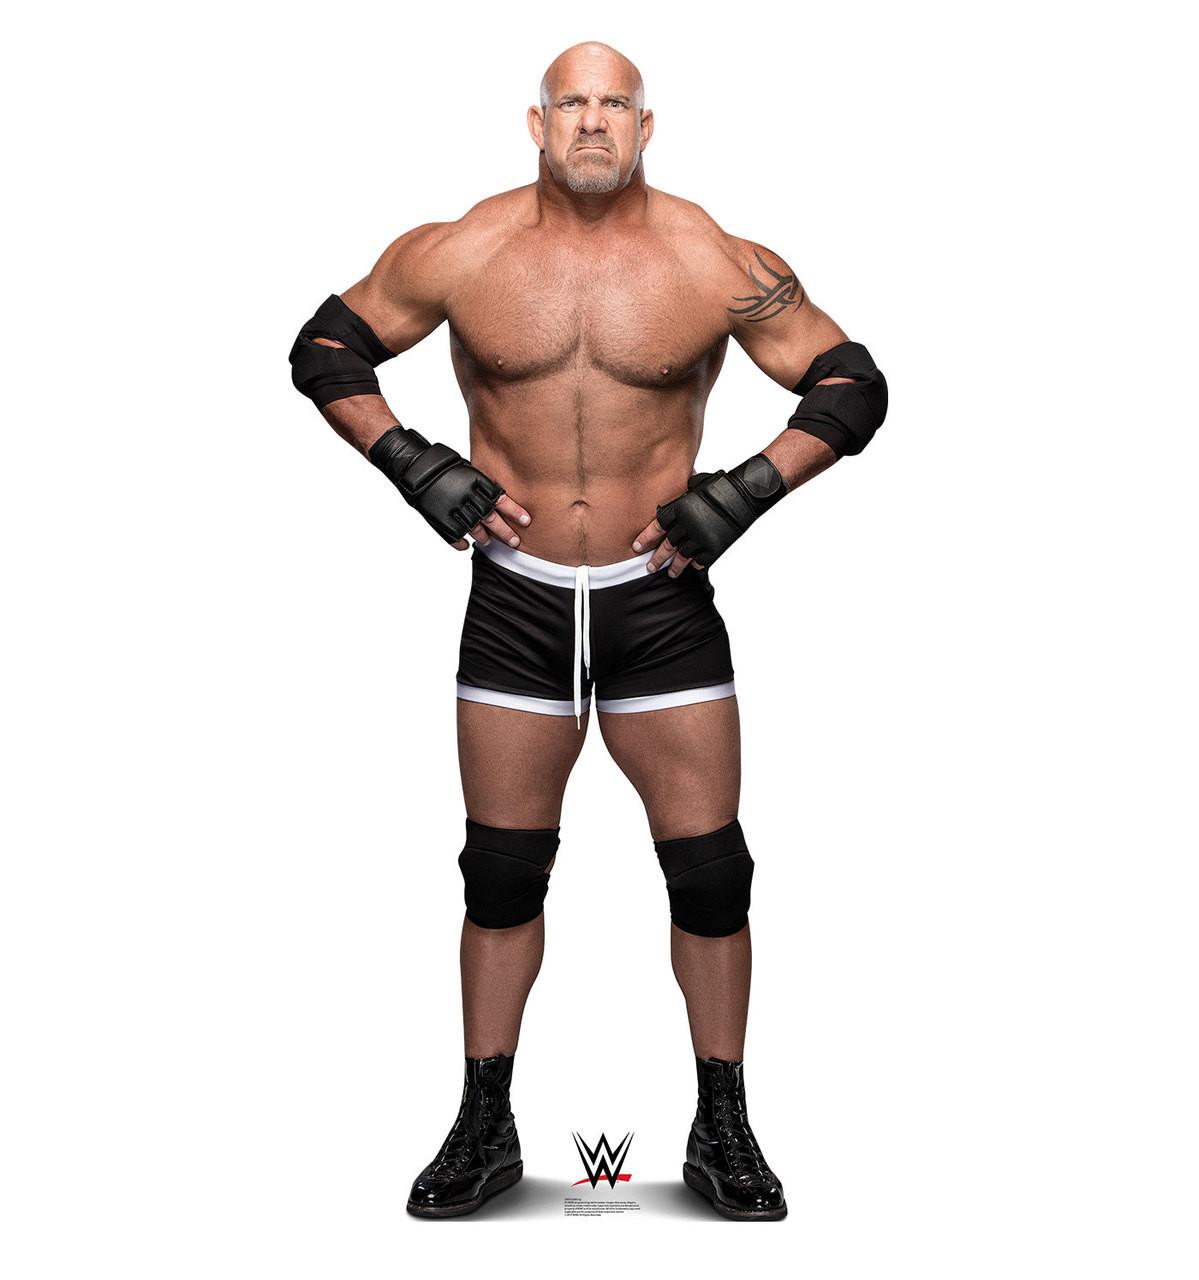 Life-size Goldberg - WWE Cardboard Standup | Cardboard Cutout 3